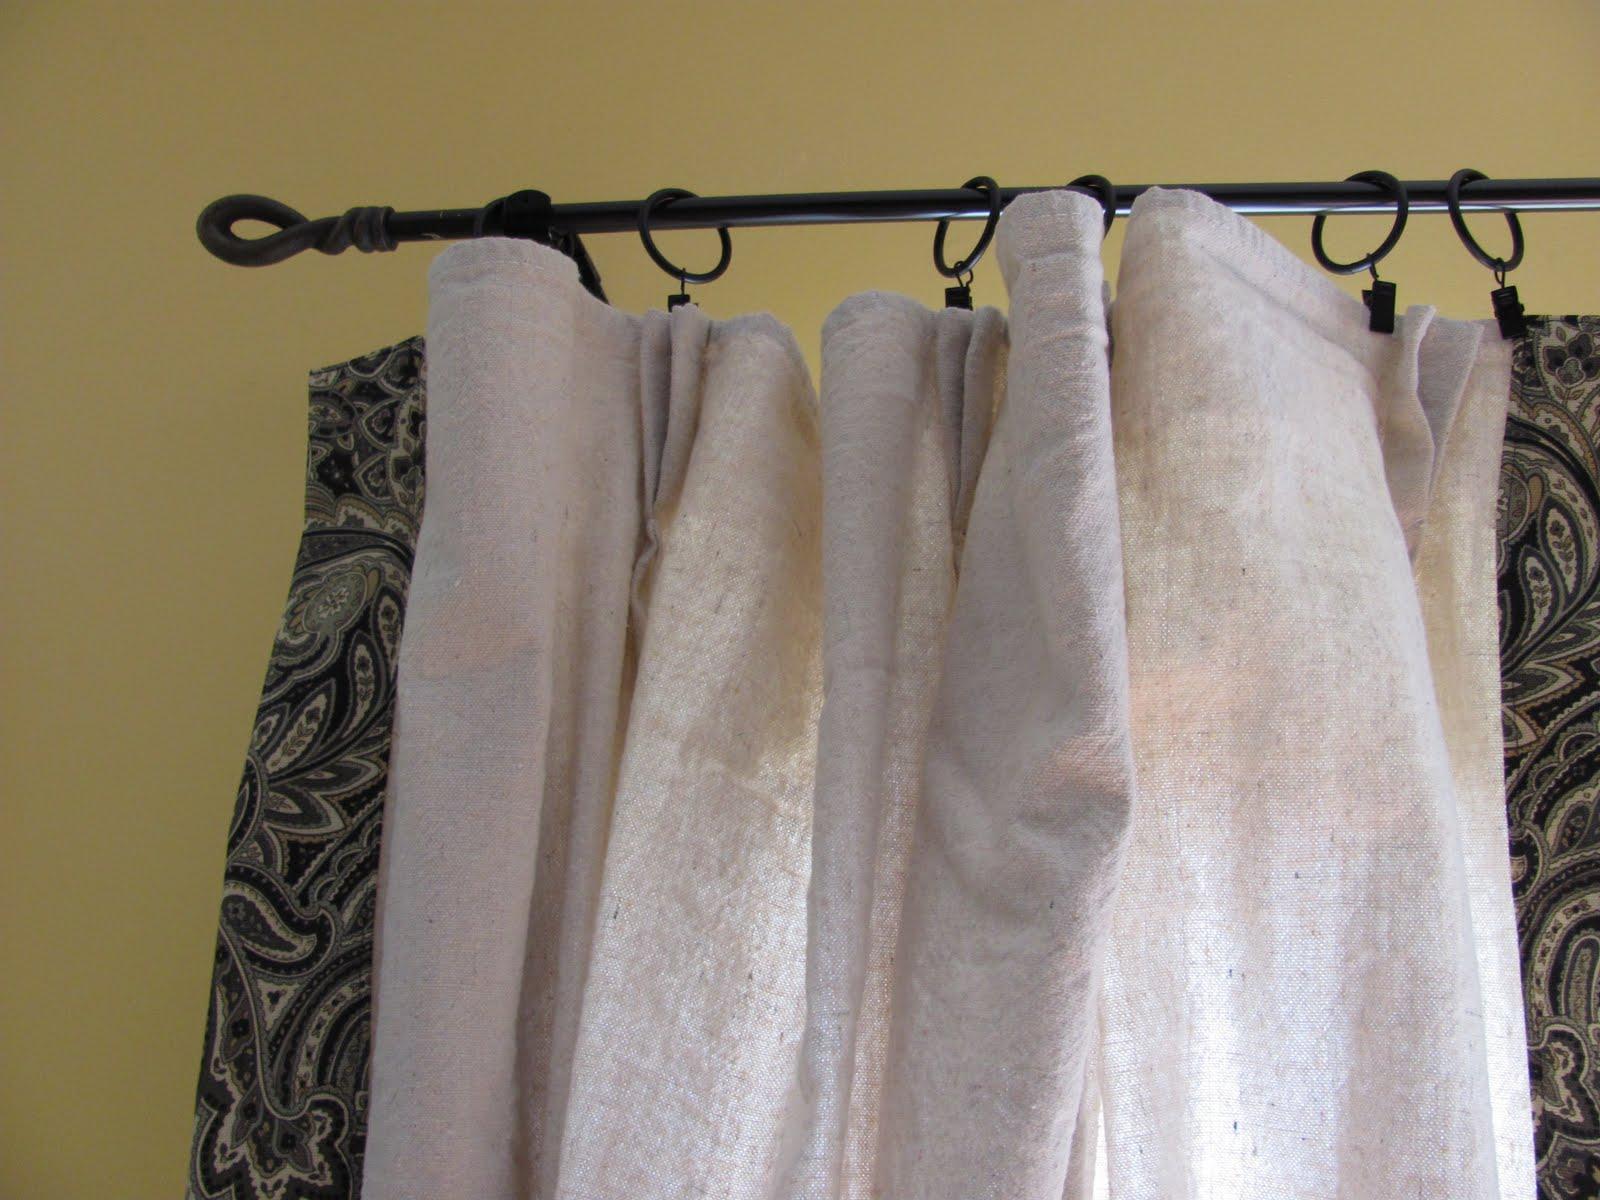 7 foot curtain rod